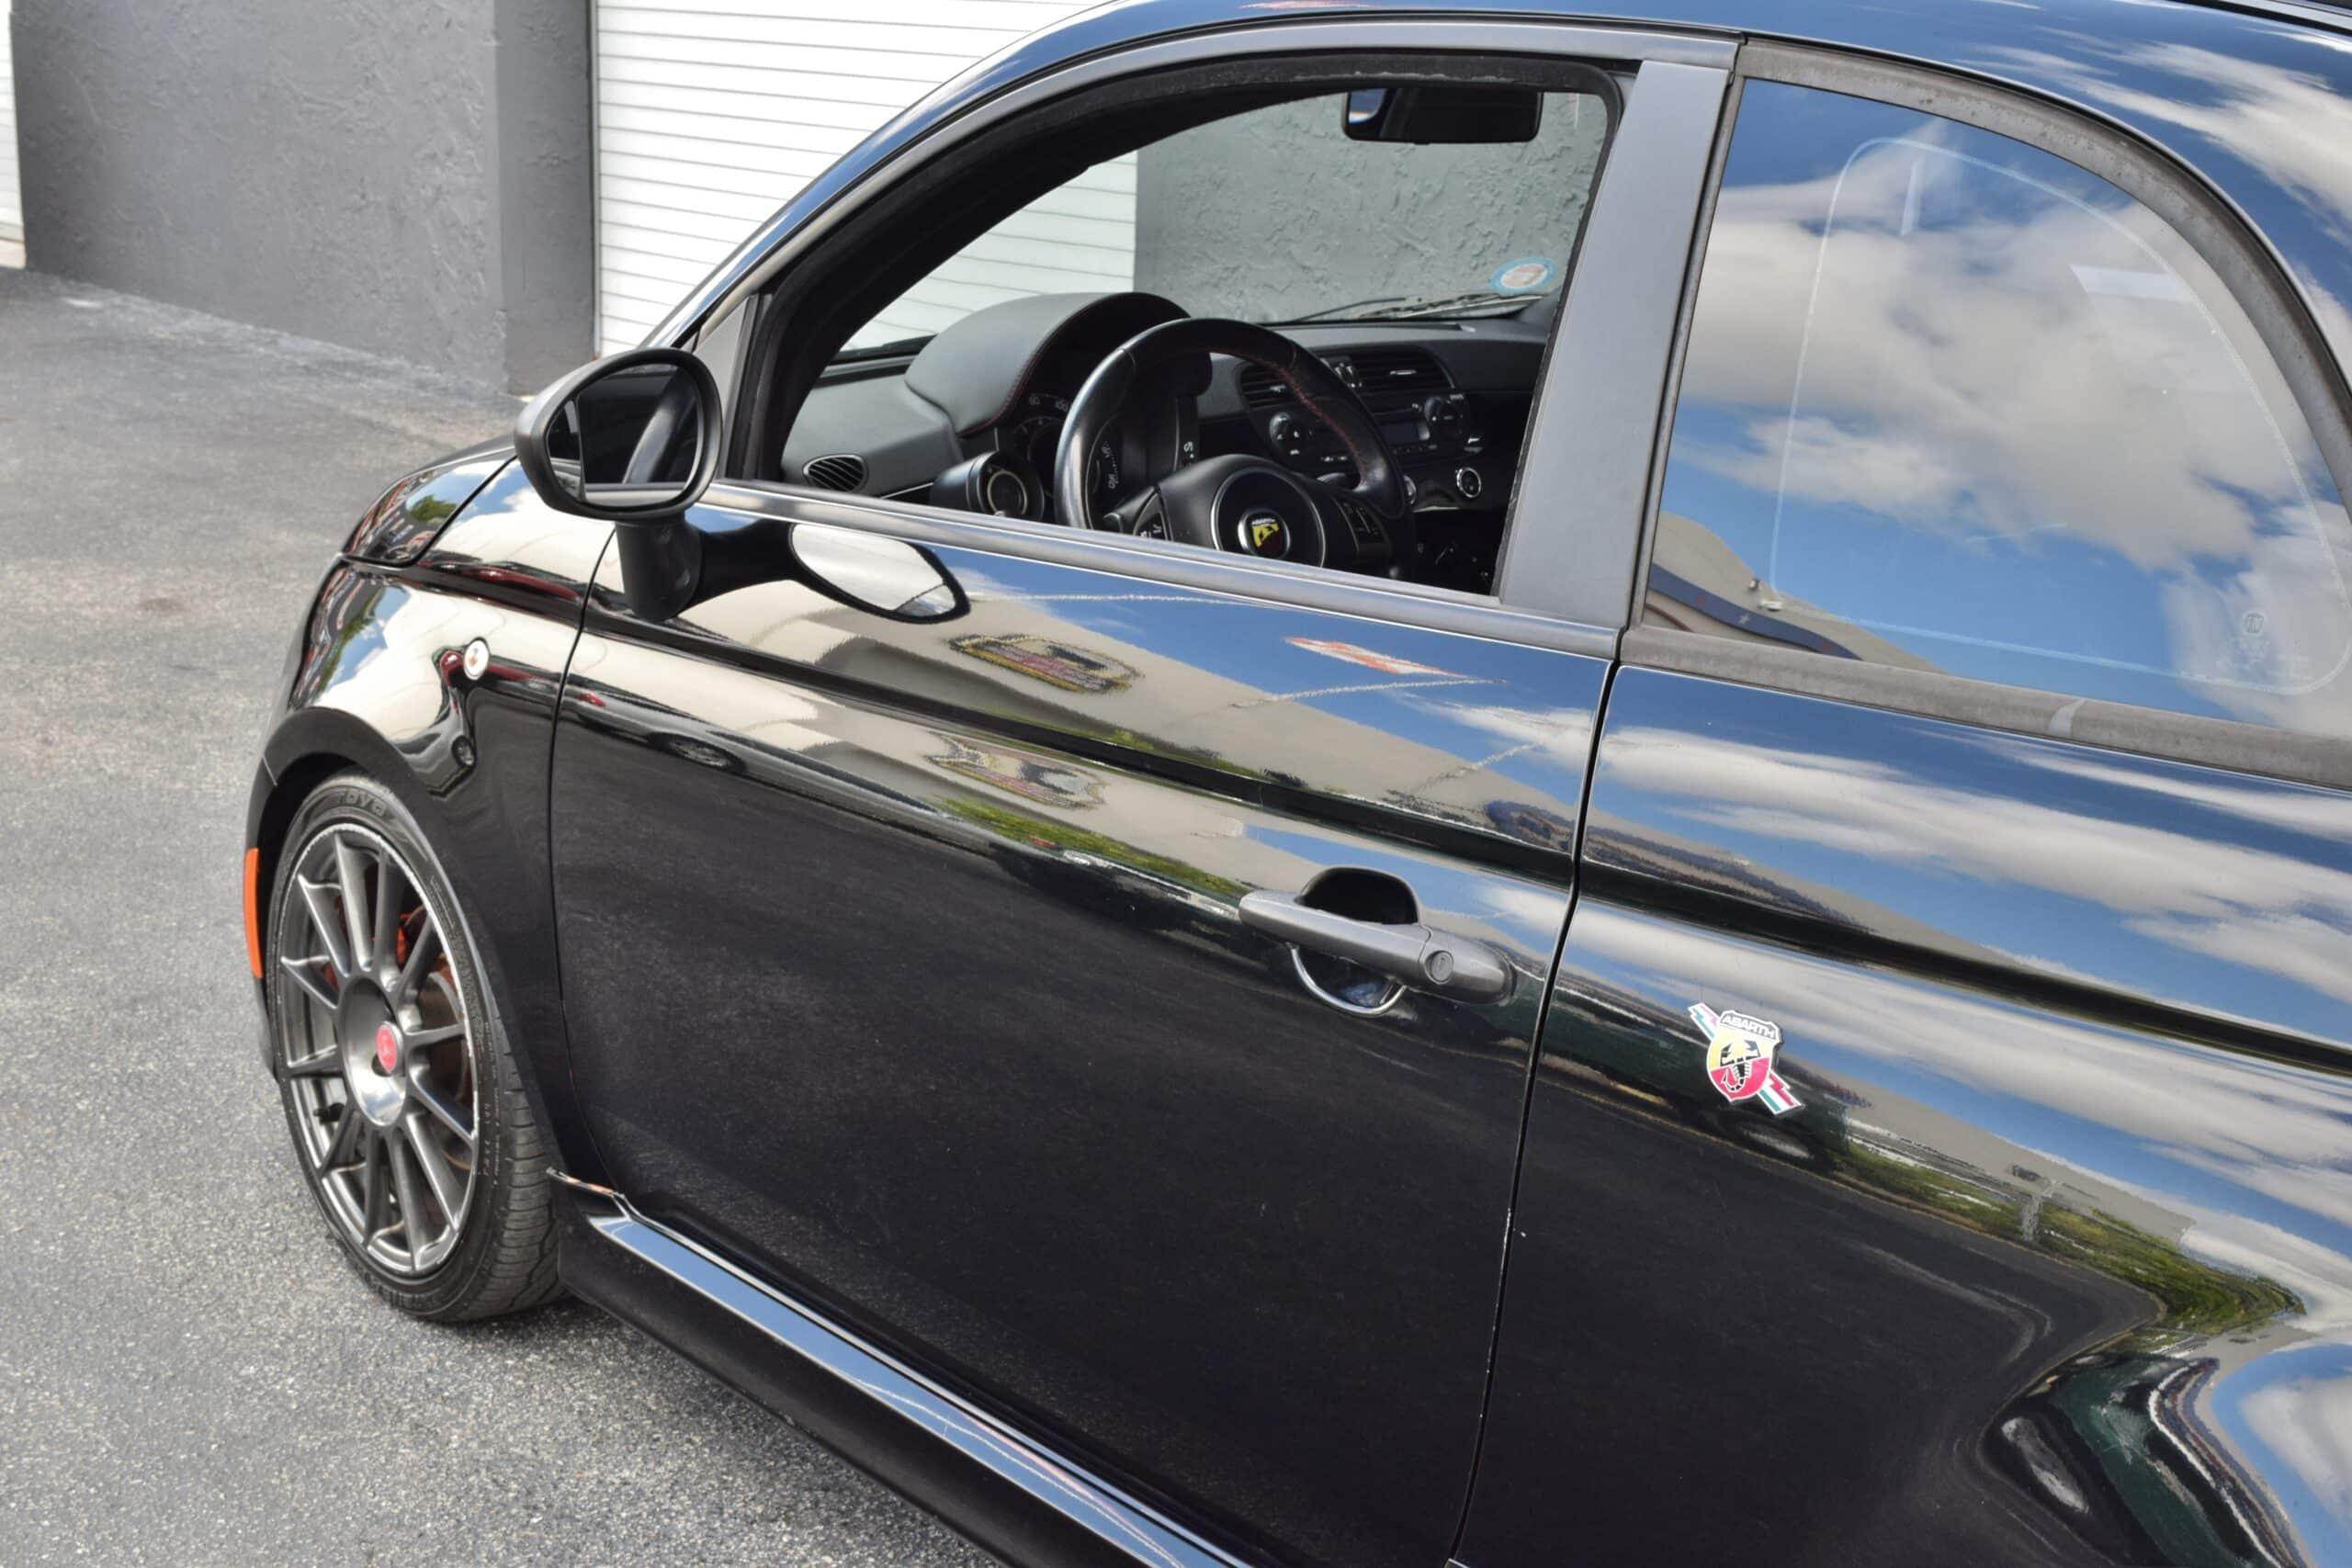 2013 Fiat 500 C Abarth Black on Black – Well Maintained – TURBO – Clean Carfax -Original Window Sticker